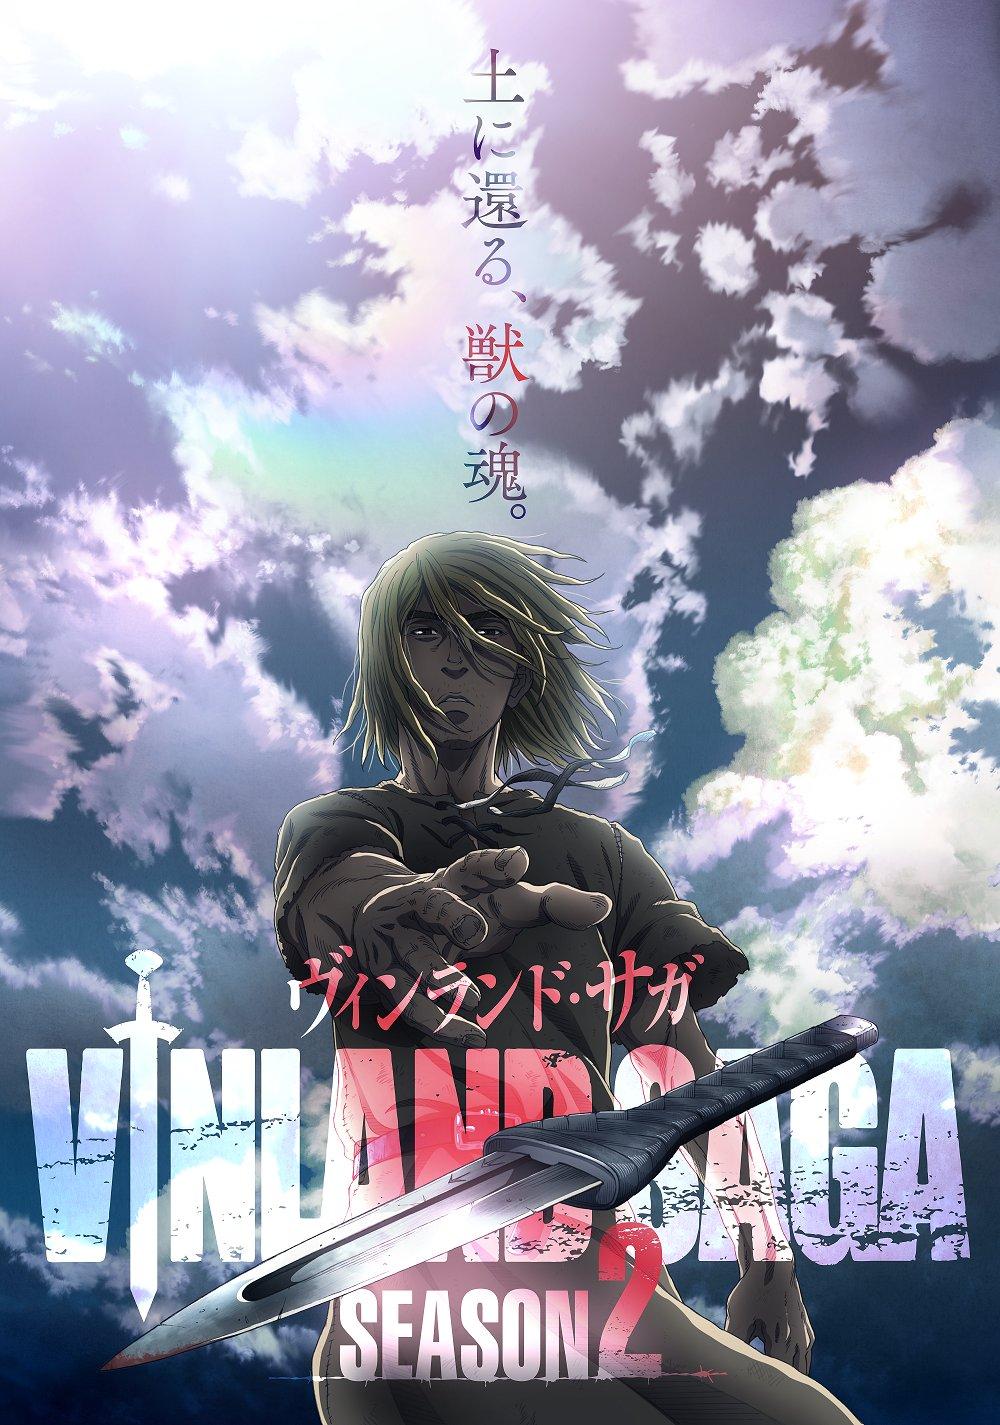 Сага о Ванланде второй сезон, плакат